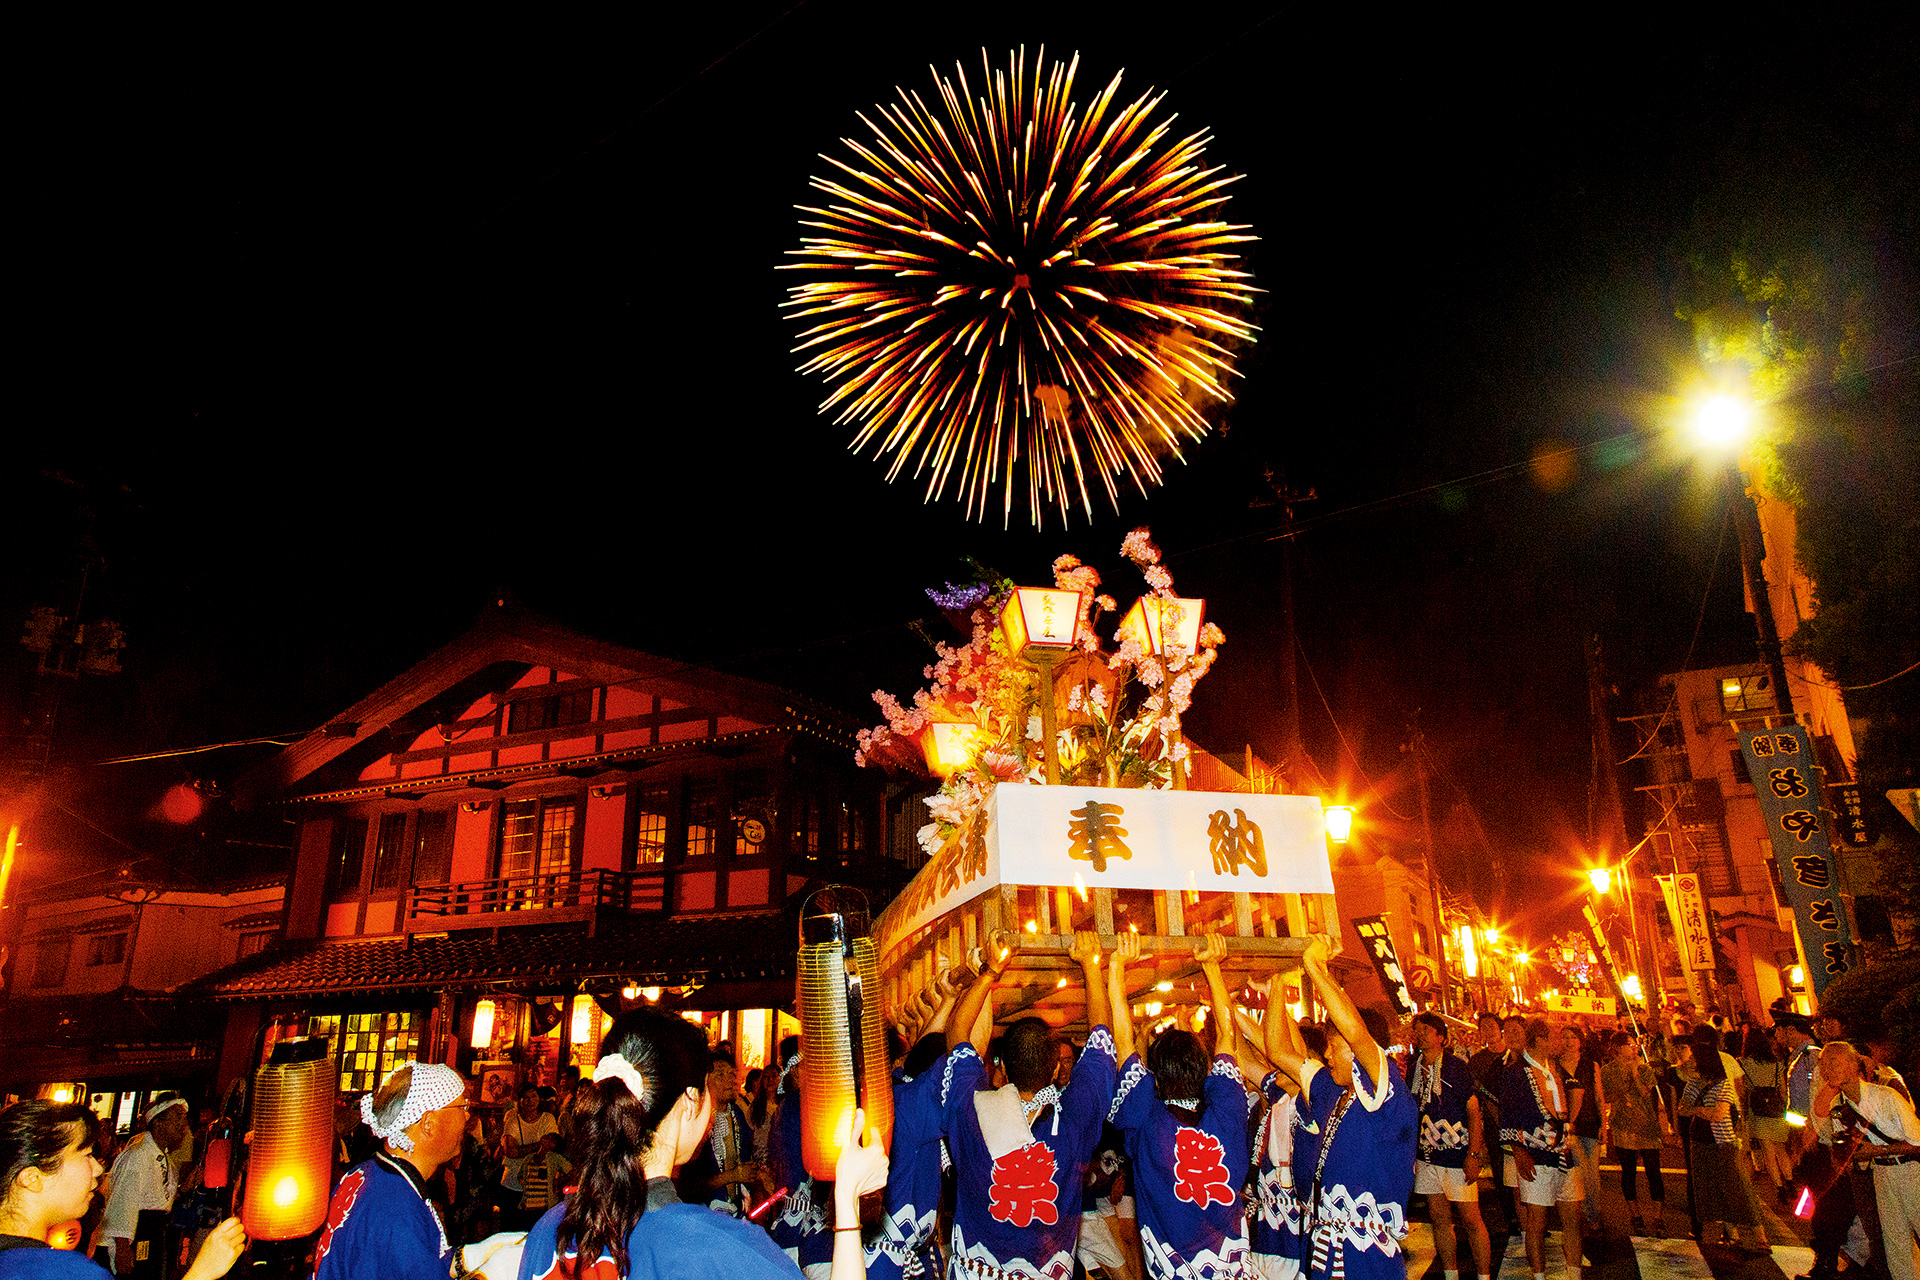 Feel the historic Yahiko Lantern Festival and fireworks